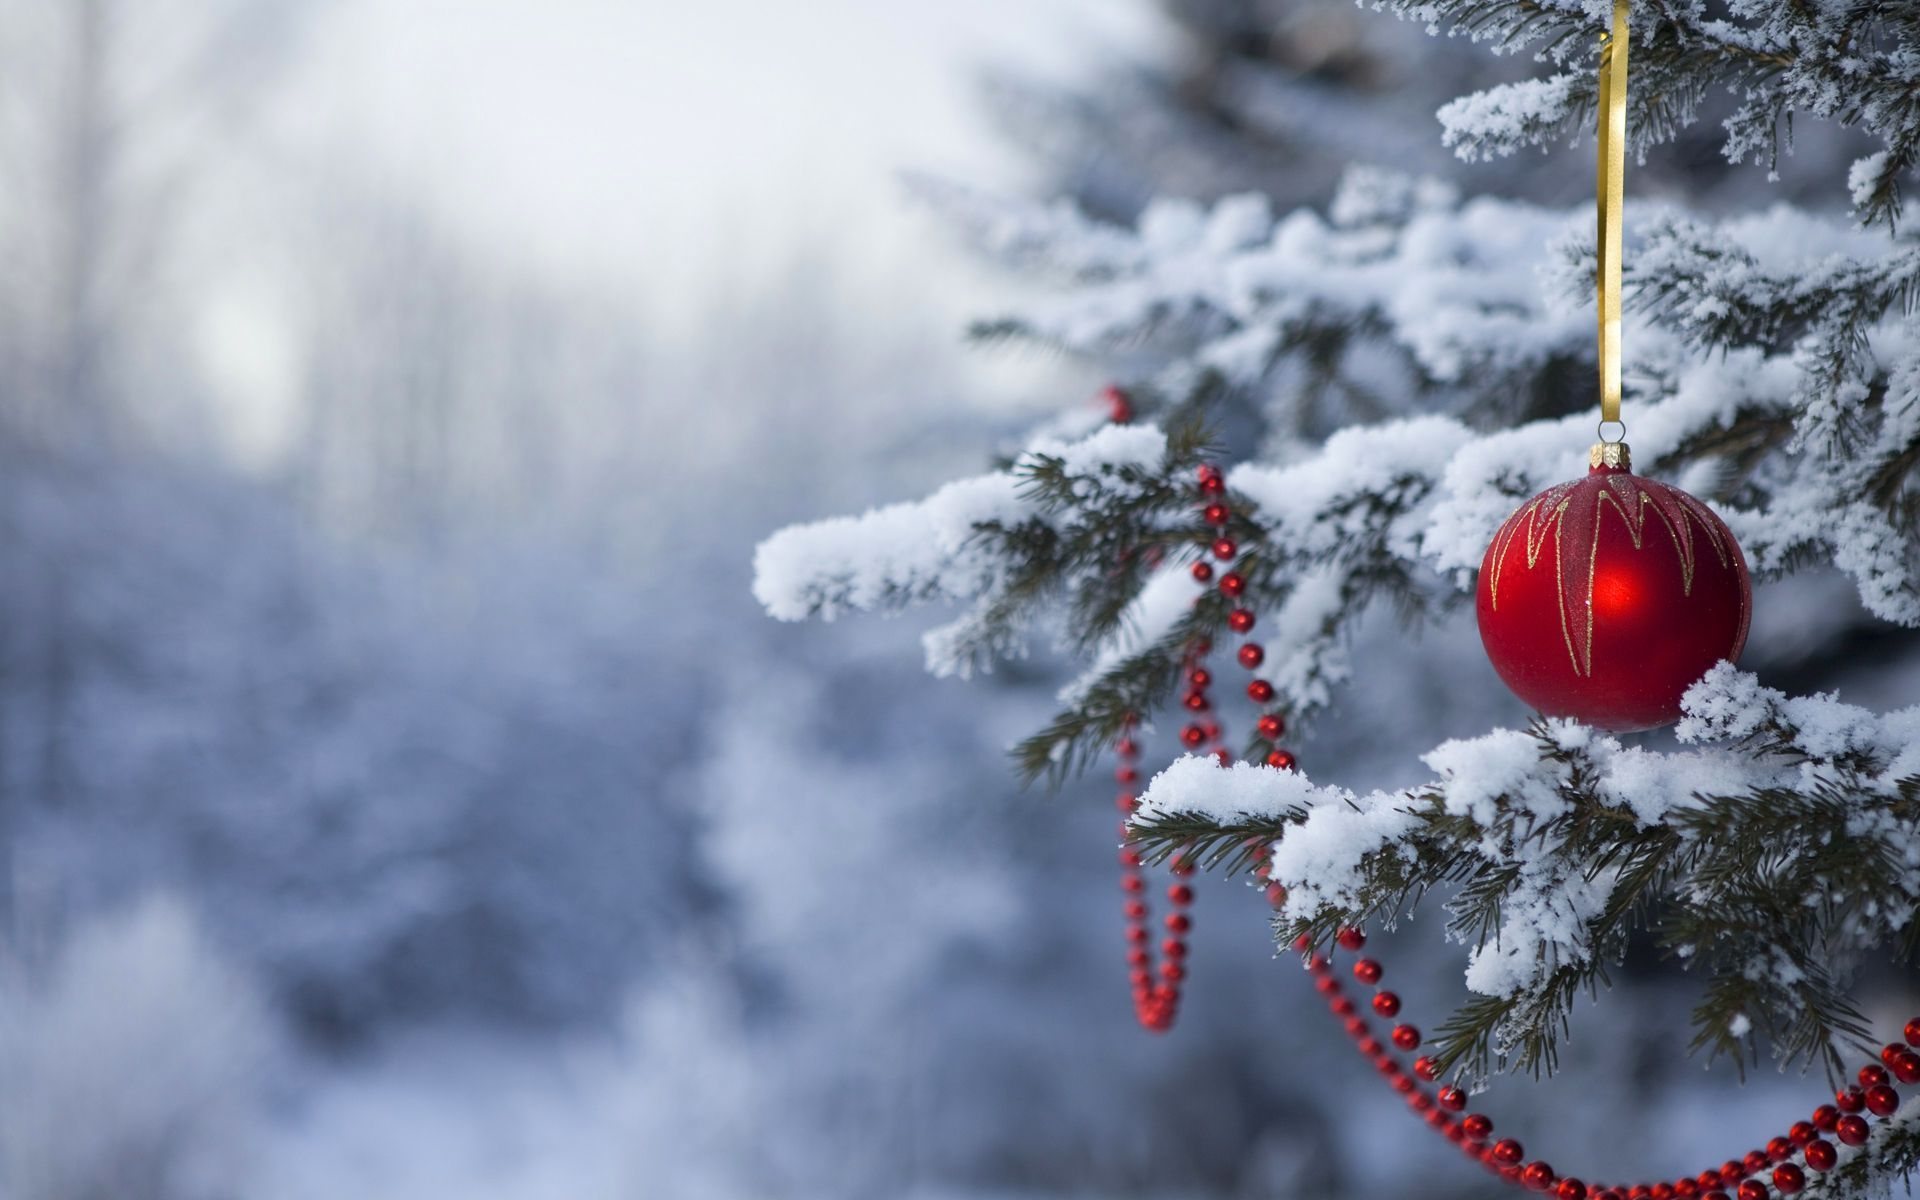 Winter Christmas Desktop Wallpapers Top Free Winter Christmas Desktop Backgrounds Wallpaperaccess